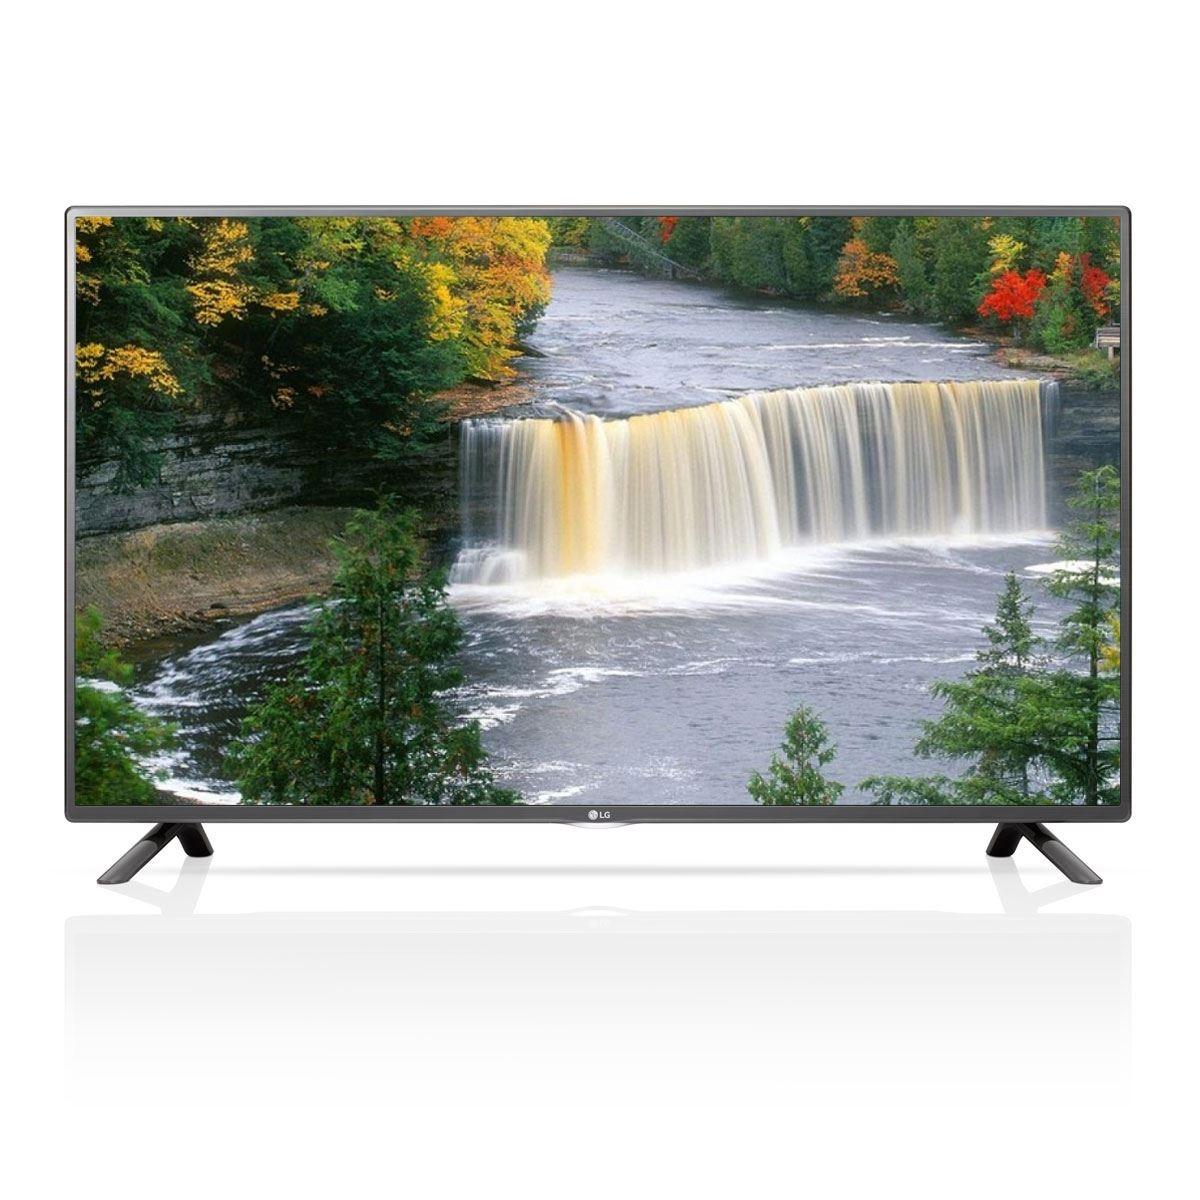 LG 50inch 6100 Series LED HDTV - 50LF6100